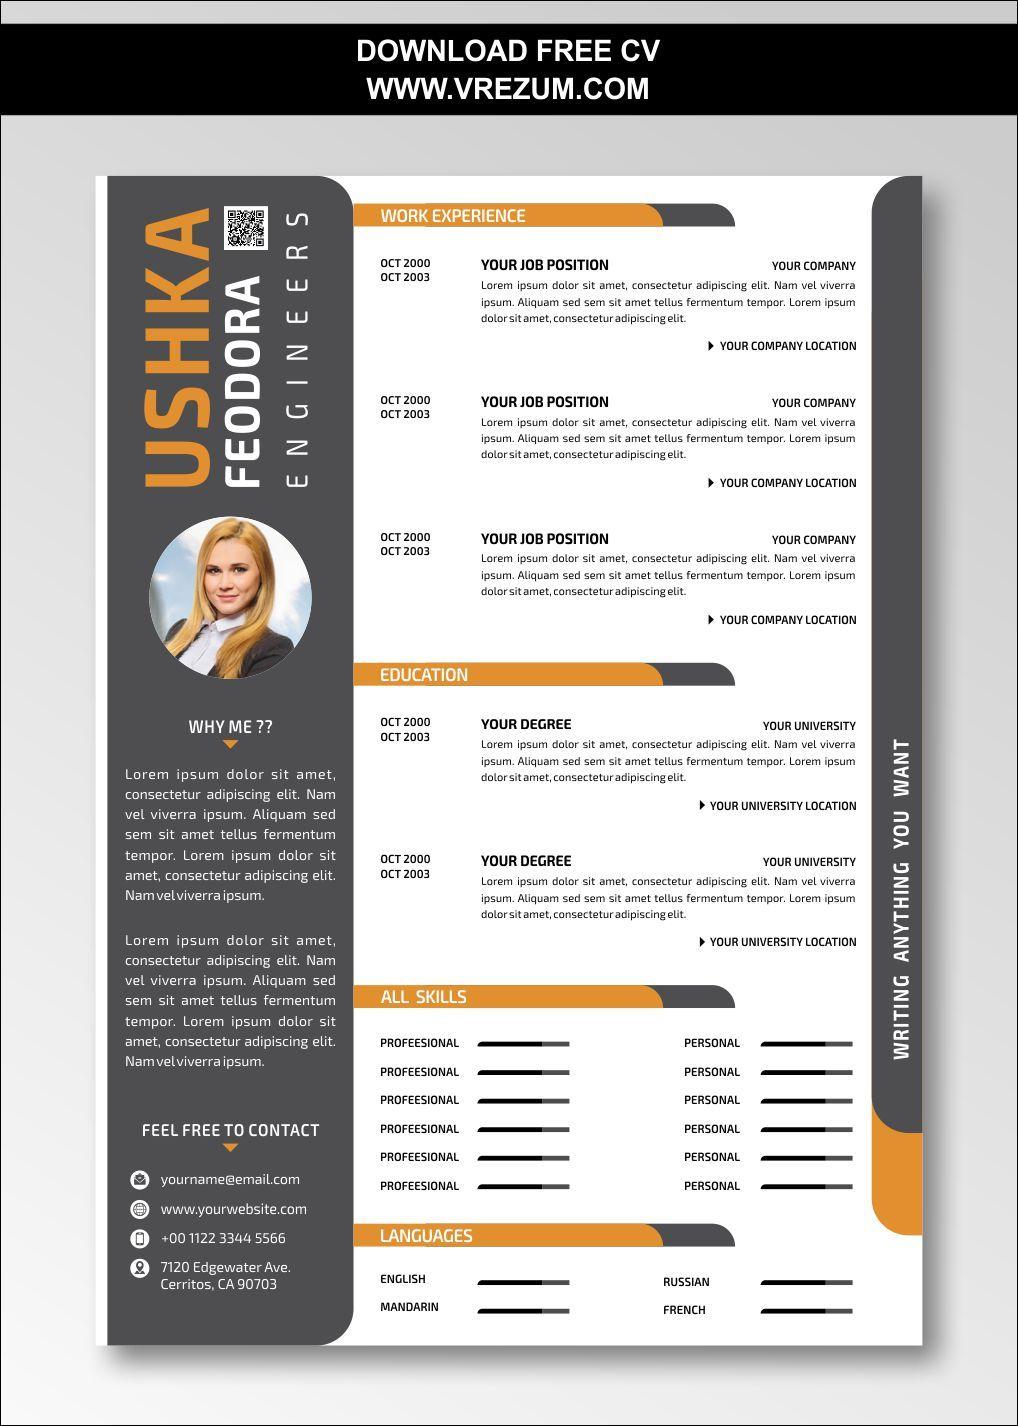 Editable Free Cv Templates For Fresh Graduate Engineer Cv Template Free Cv Template Creative Cv Template Resume template for new graduates